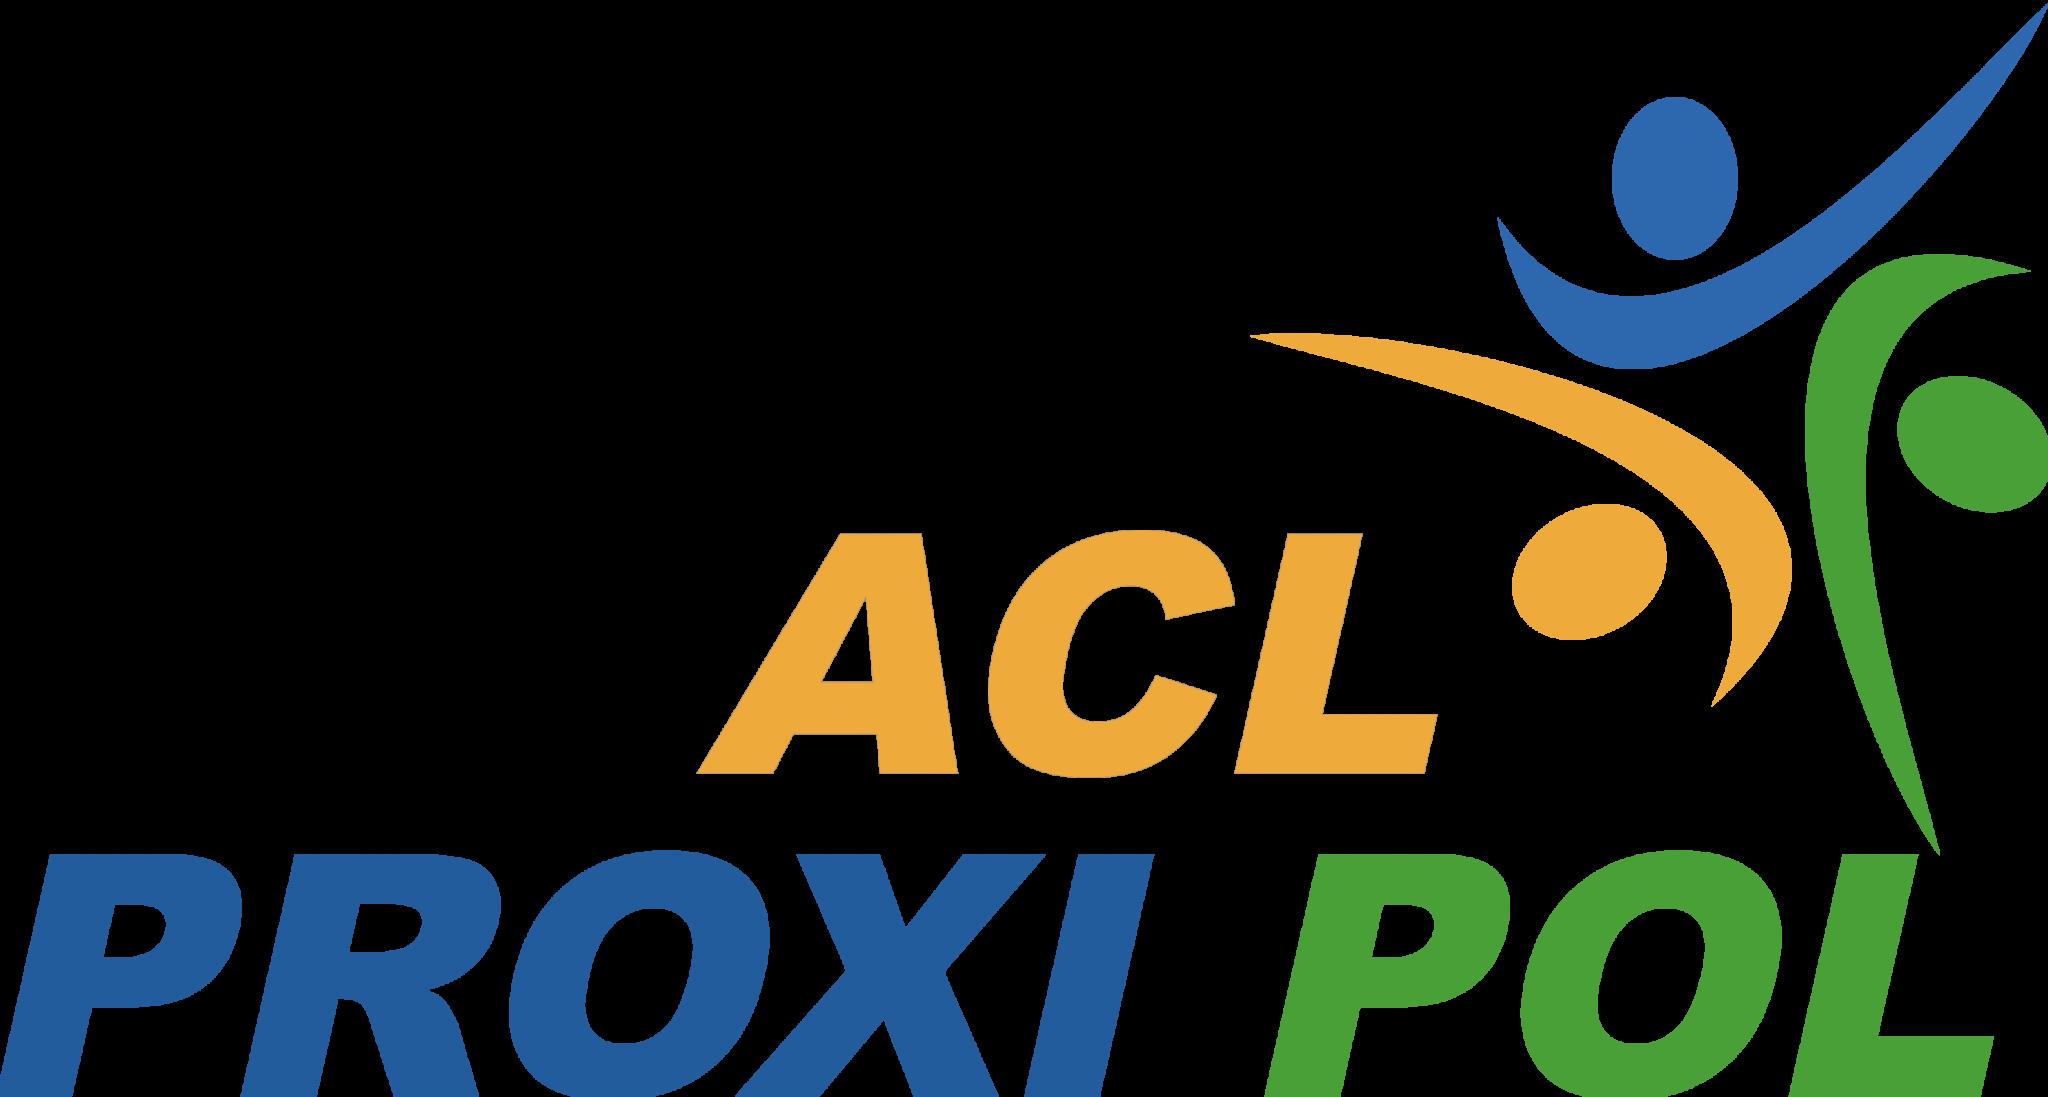 ACL PROXI POL